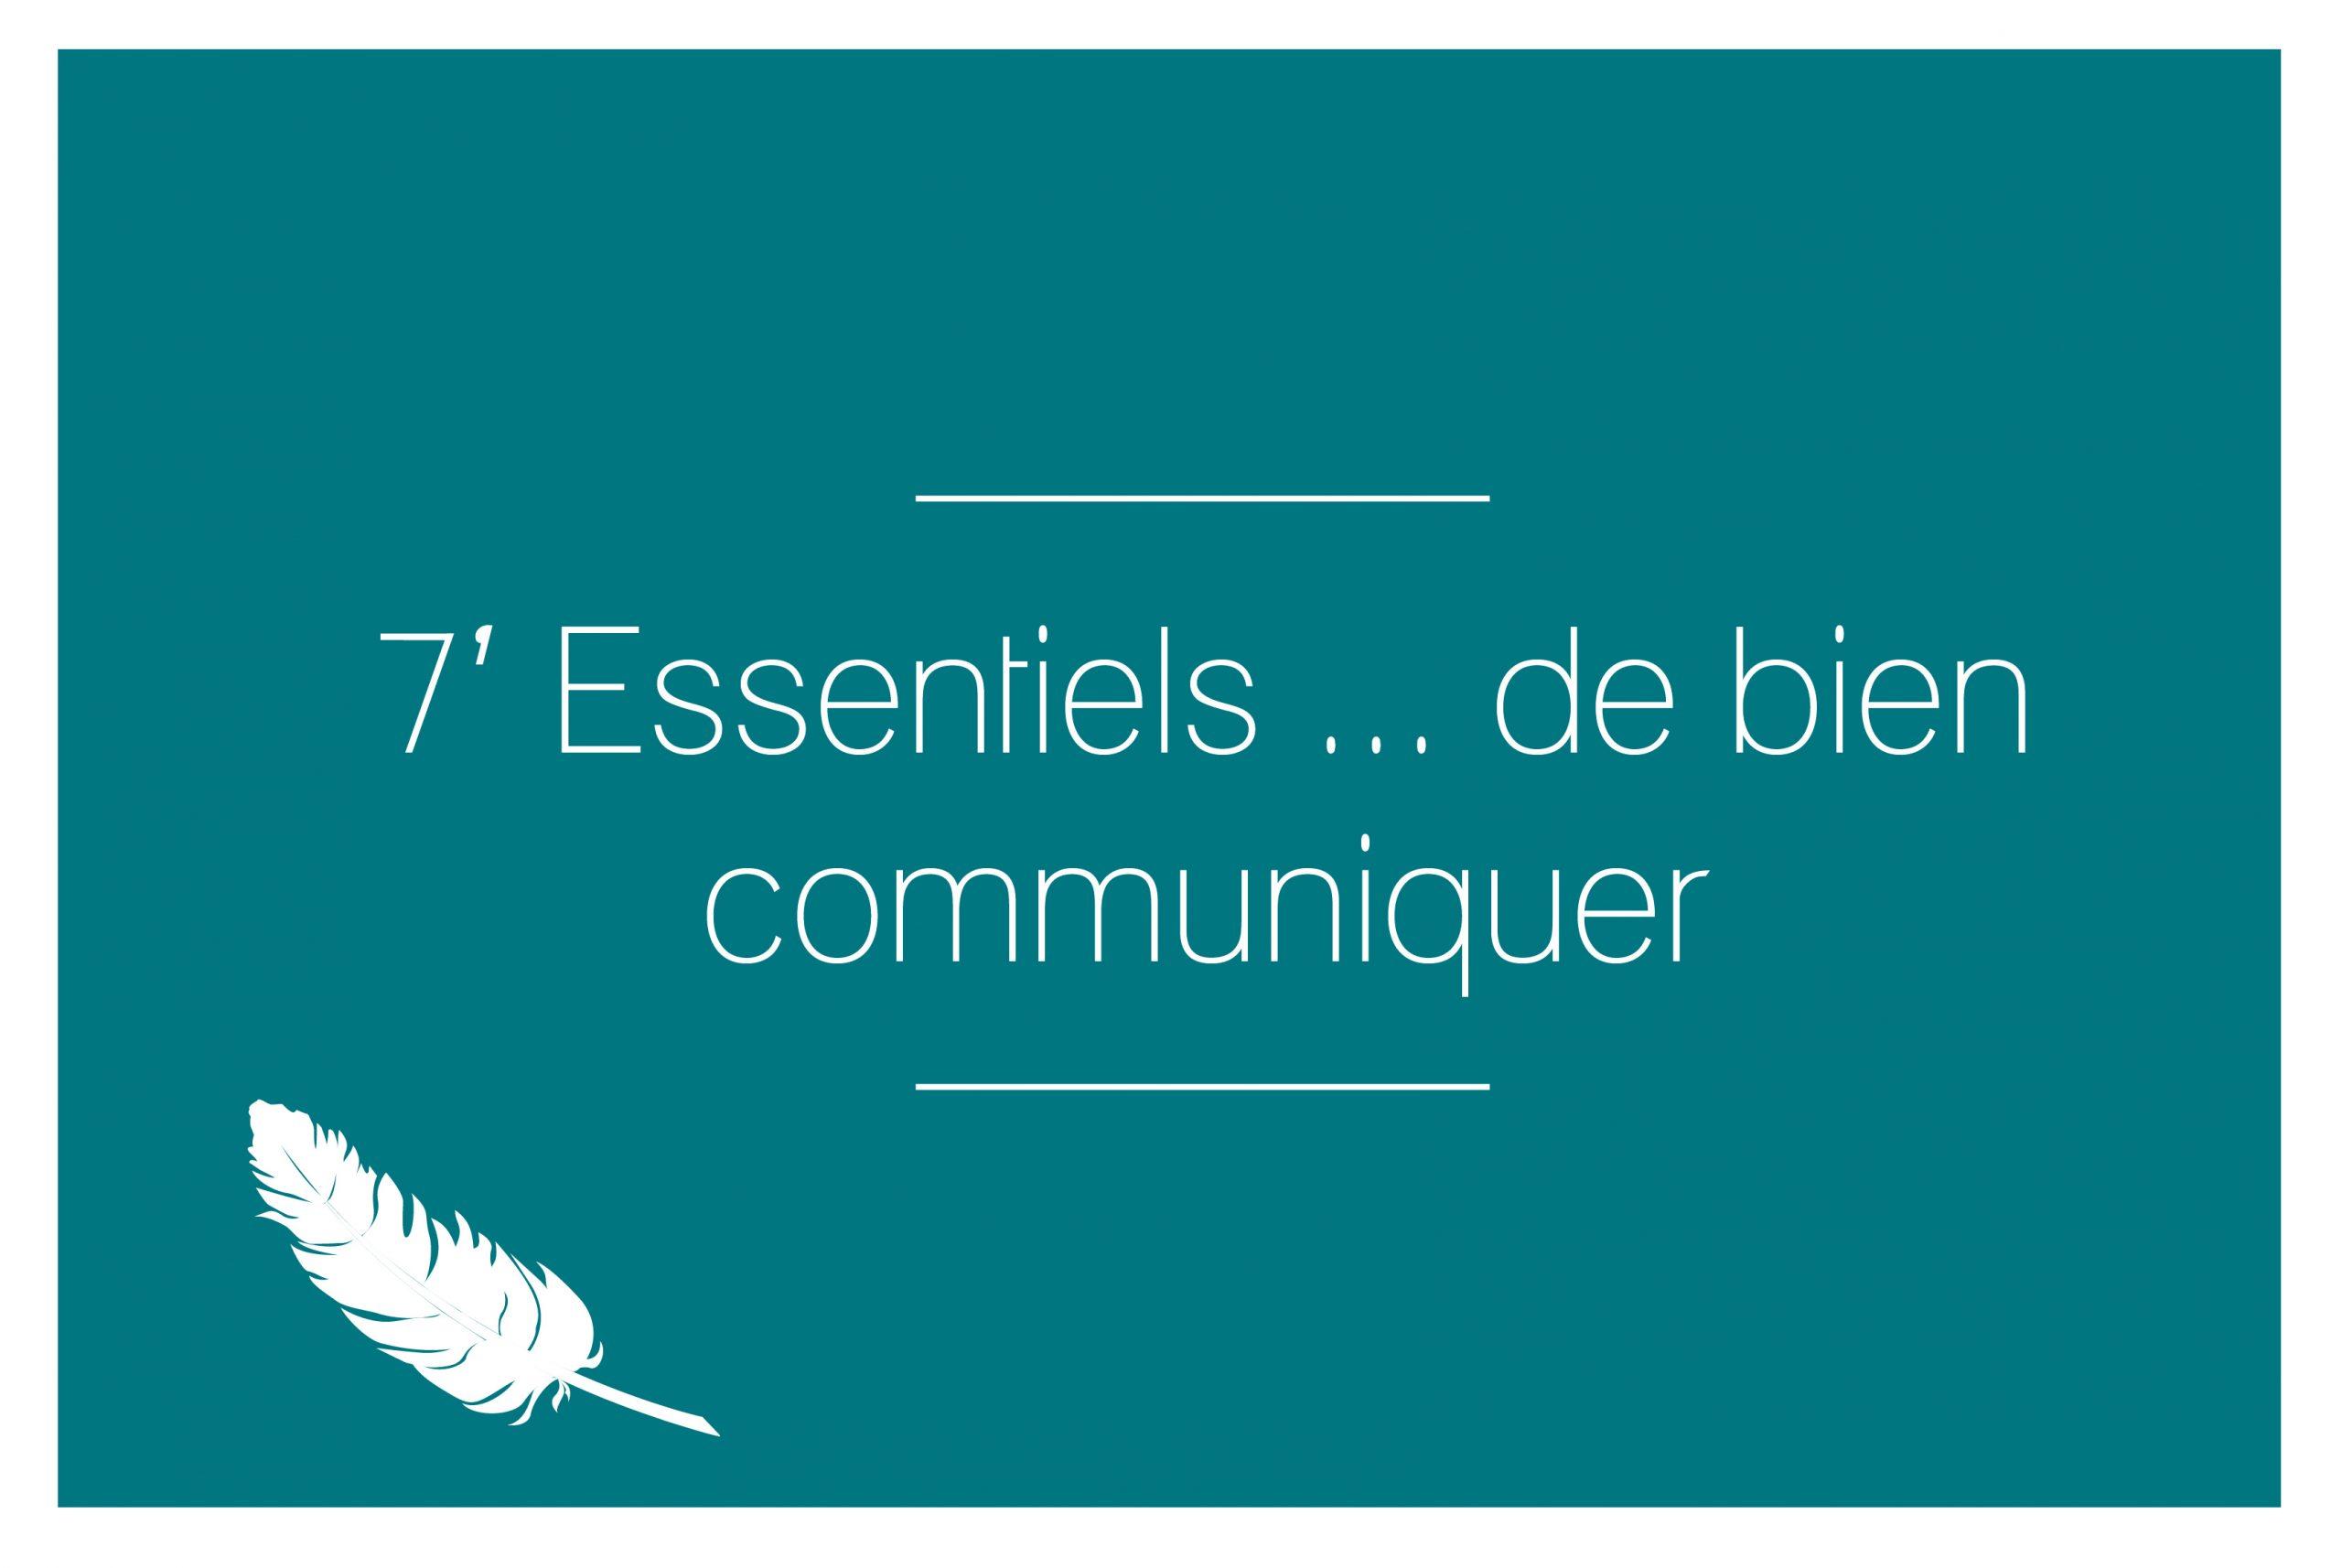 7Essentiels-Communication Globale & Digitale-65